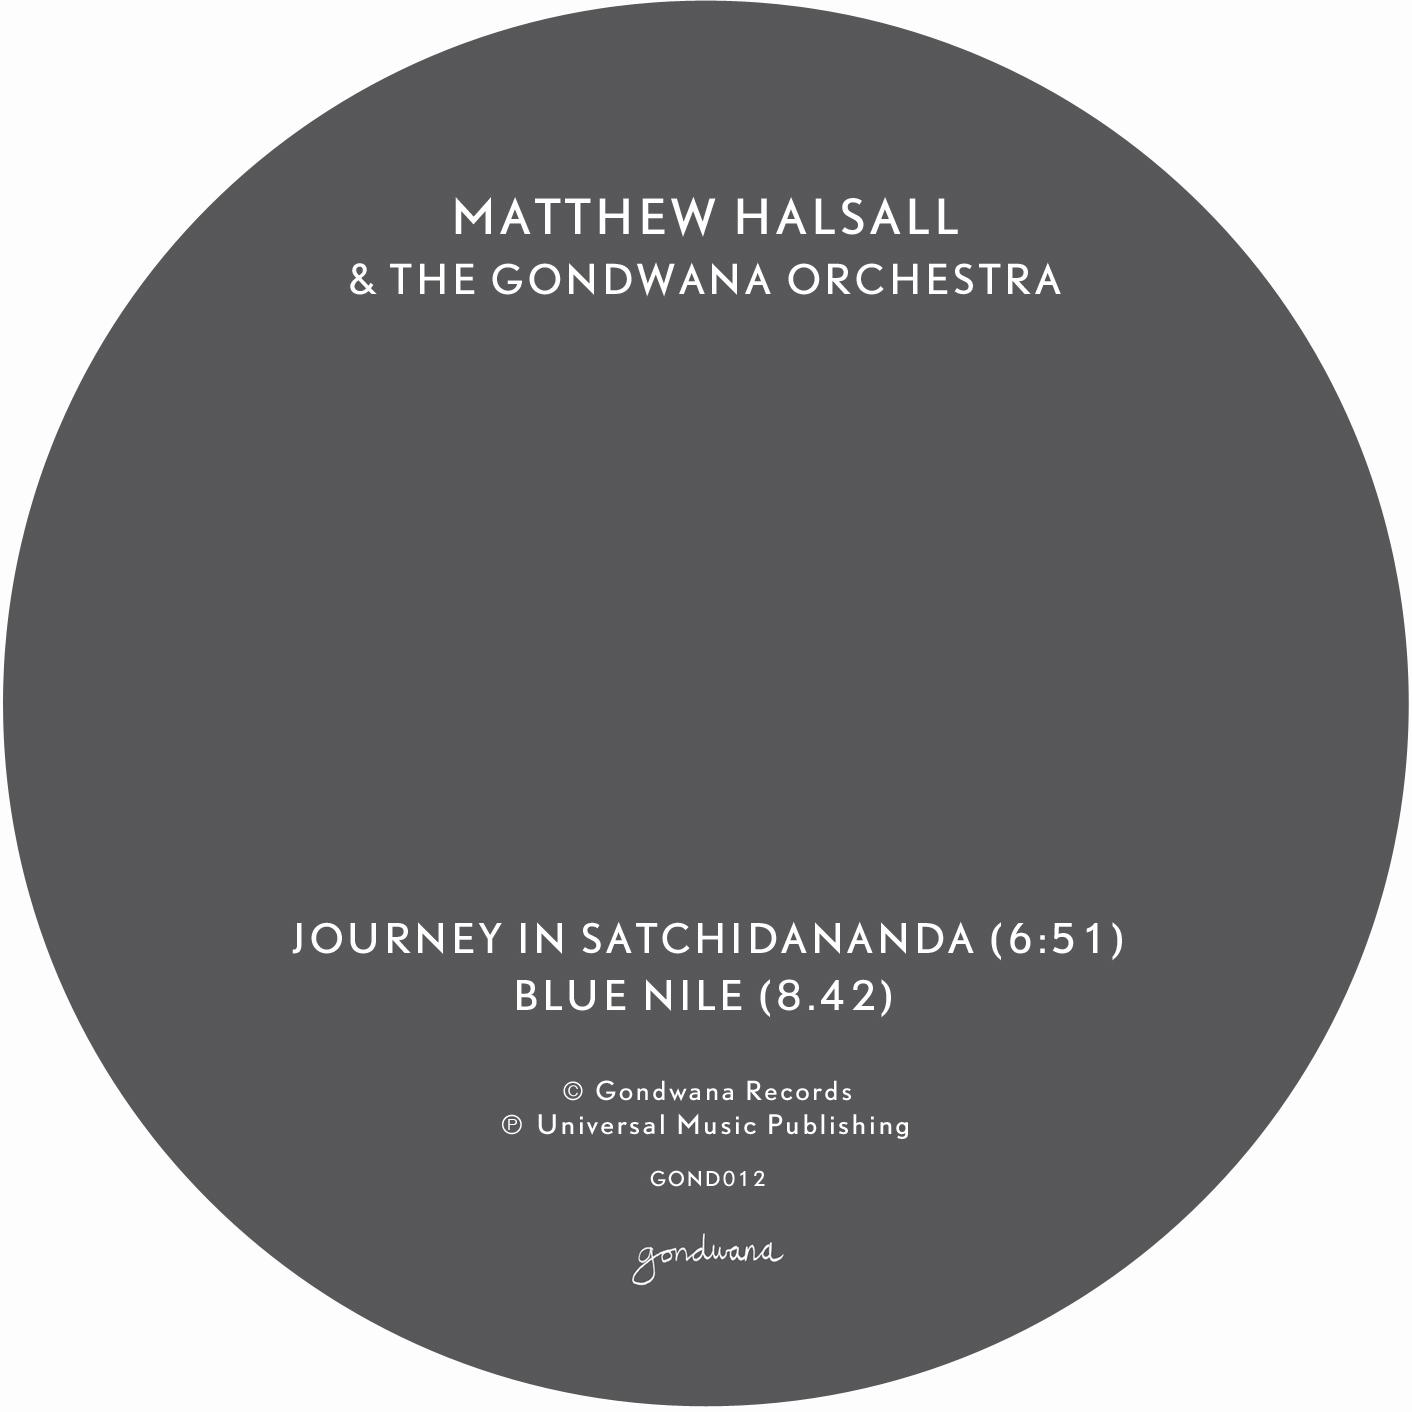 Order Matthew Halsall & The Gondwana Orchestra's Journey In Satchidananda / Blue Nile 12″ / DL